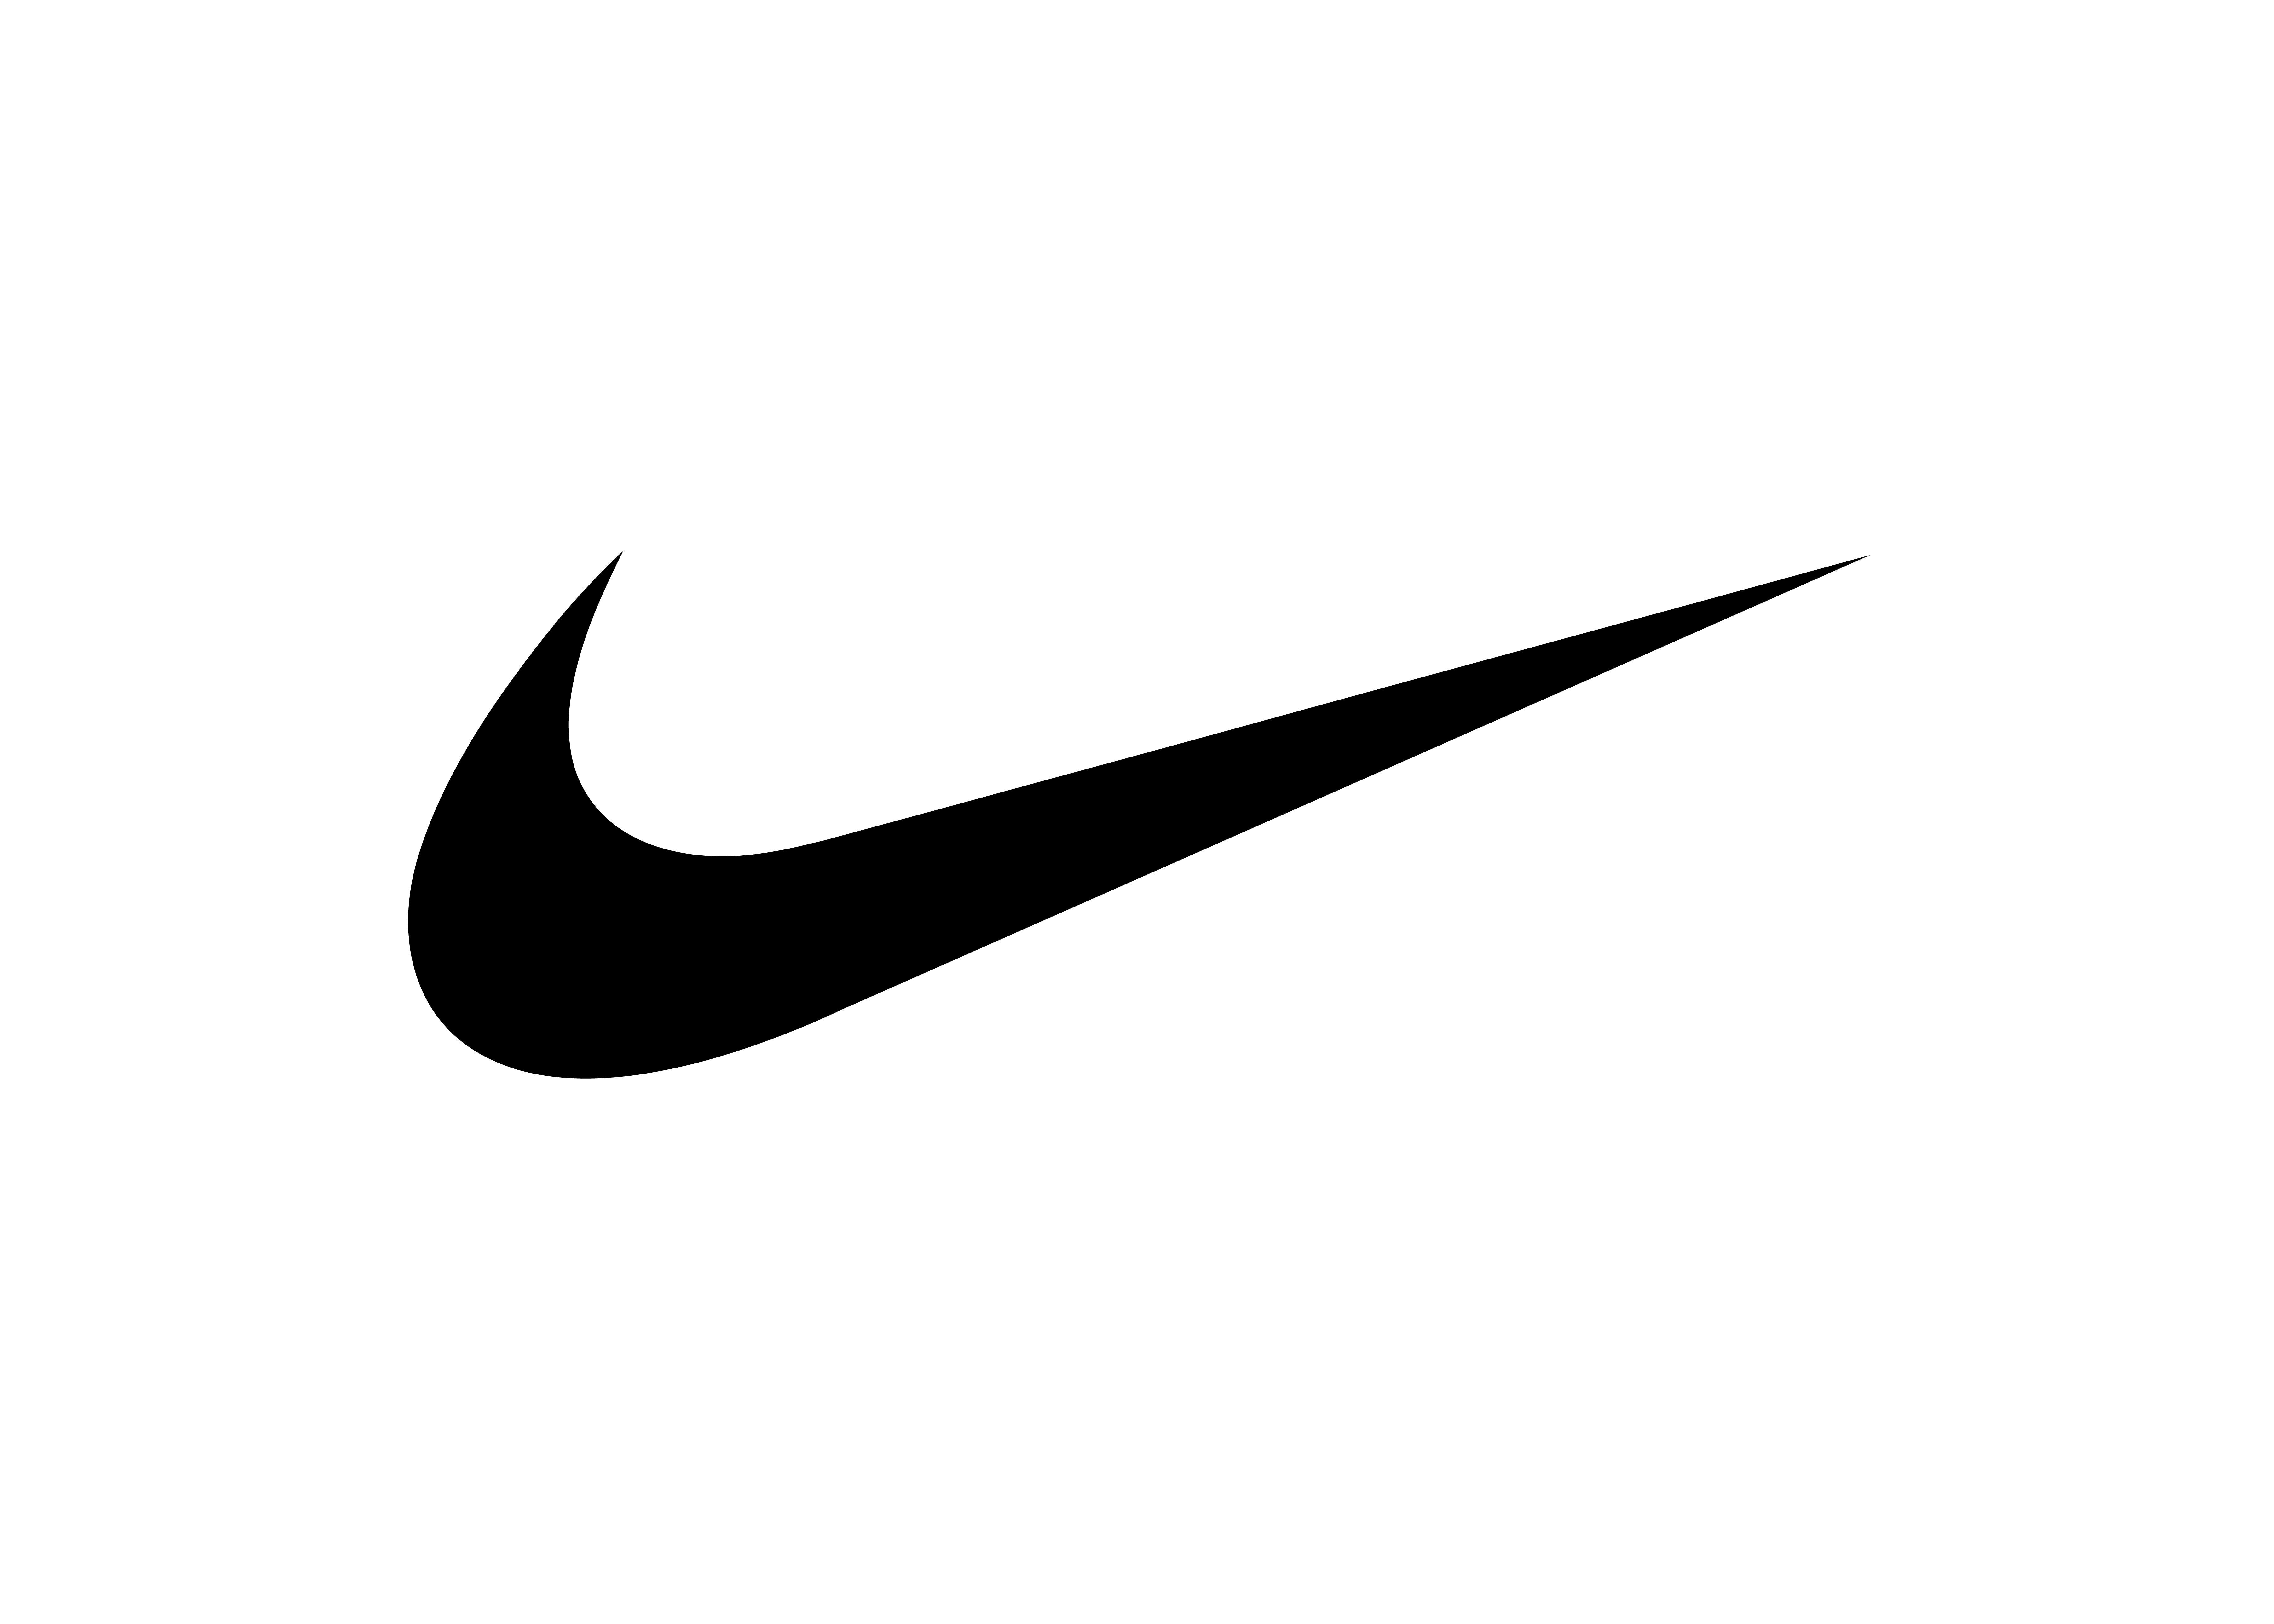 Pin by tennisvine.com on Tennis - Logos | Pinterest | Nike logo ...